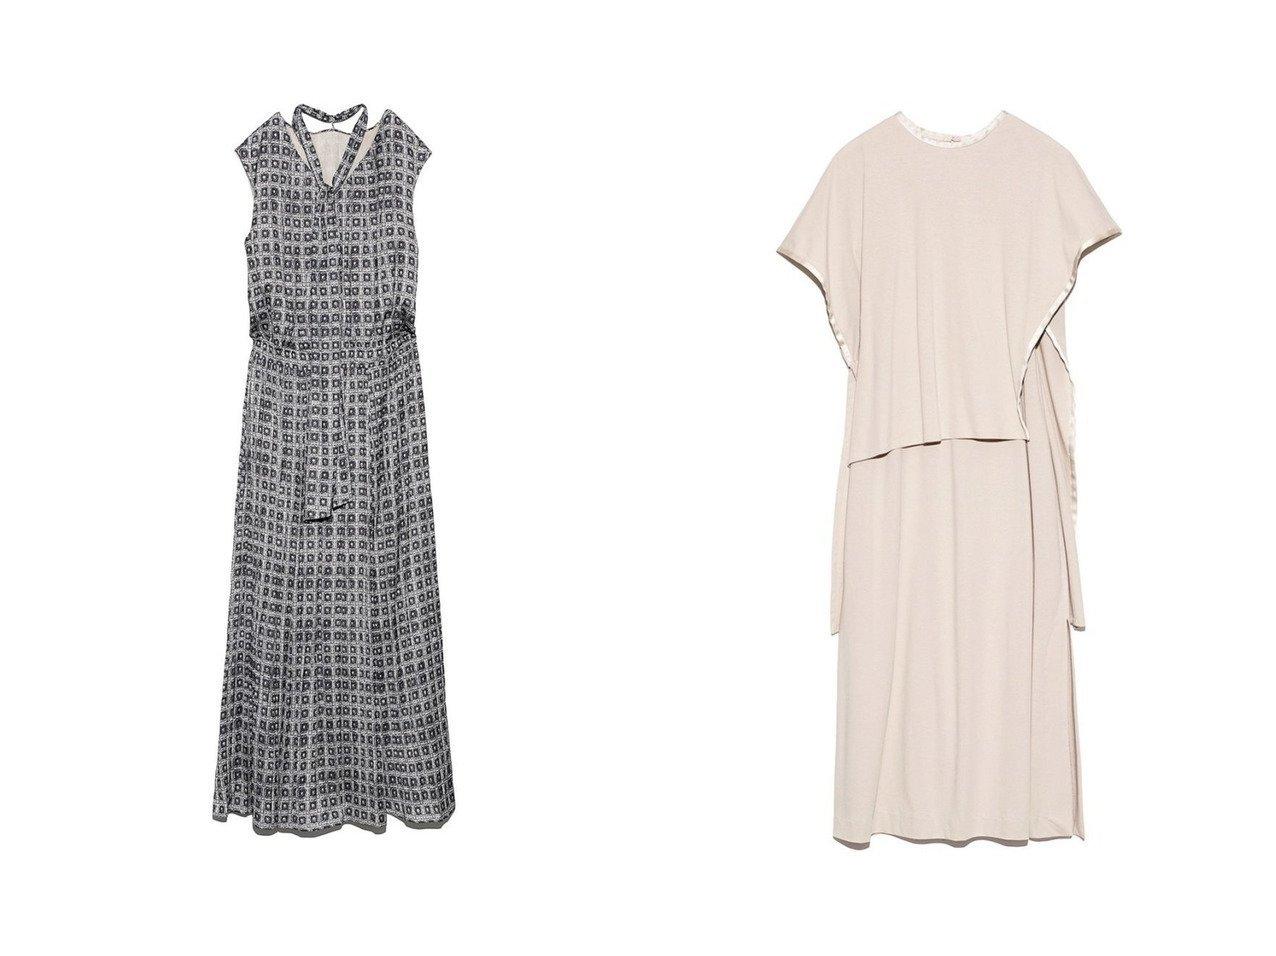 【FRAY I.D/フレイ アイディー】のパイピングケープワンピ&【Mila Owen/ミラオーウェン】の2wayノースリーブワッシャーボウタイワンピース ワンピース・ドレスのおすすめ!人気、トレンド・レディースファッションの通販 おすすめで人気の流行・トレンド、ファッションの通販商品 メンズファッション・キッズファッション・インテリア・家具・レディースファッション・服の通販 founy(ファニー) https://founy.com/ ファッション Fashion レディースファッション WOMEN ワンピース Dress カーディガン 今季 11月号 シャーリング ノースリーブ フィット プリント リボン ワッシャー アシンメトリー カッティング ジャージー ストレート スリット スリーブ セットアップ ドッキング パイピング リラックス |ID:crp329100000011518